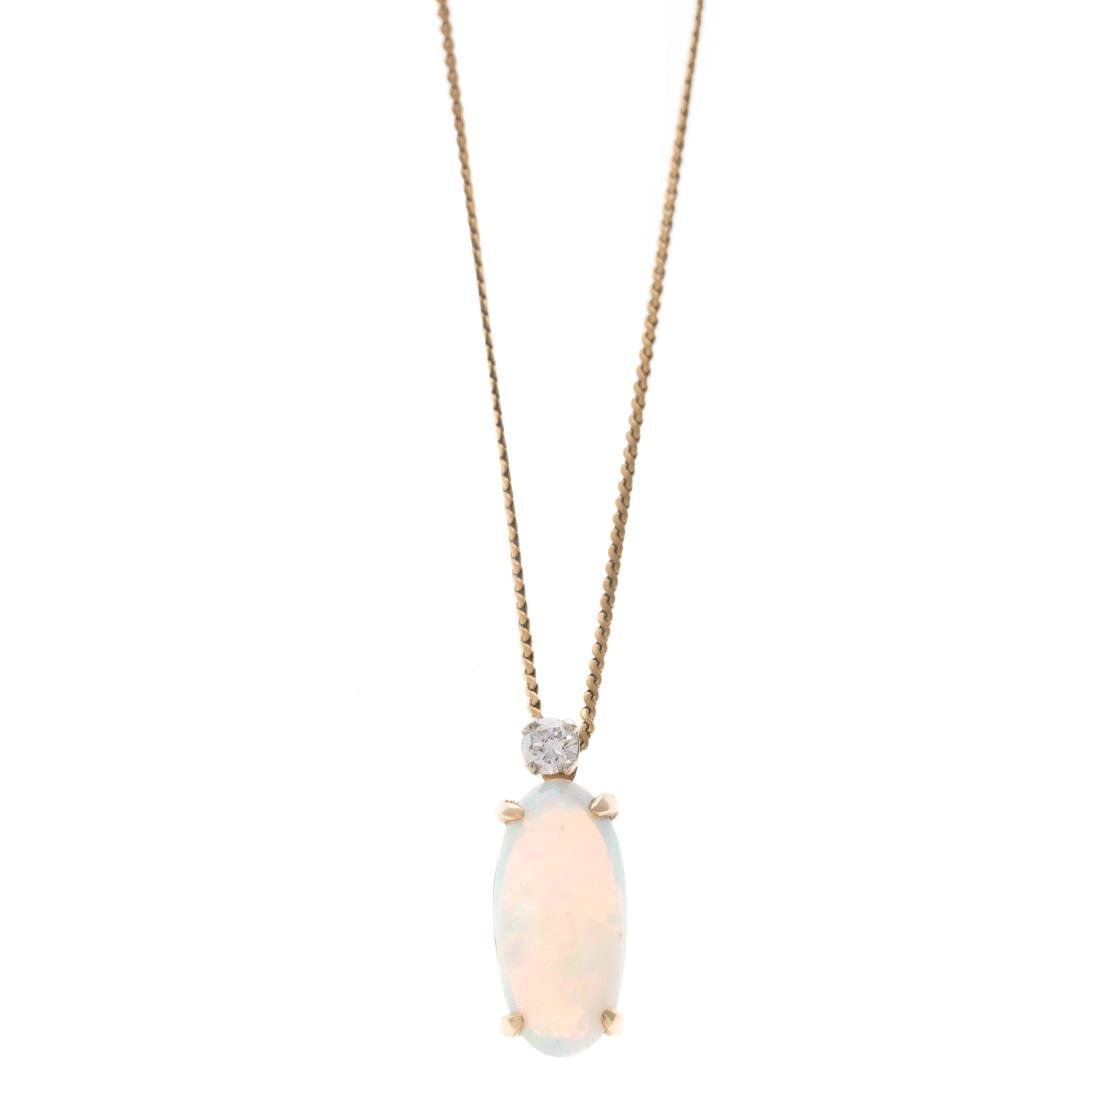 A Lady's 18K Opal and Diamond Pendant - 2